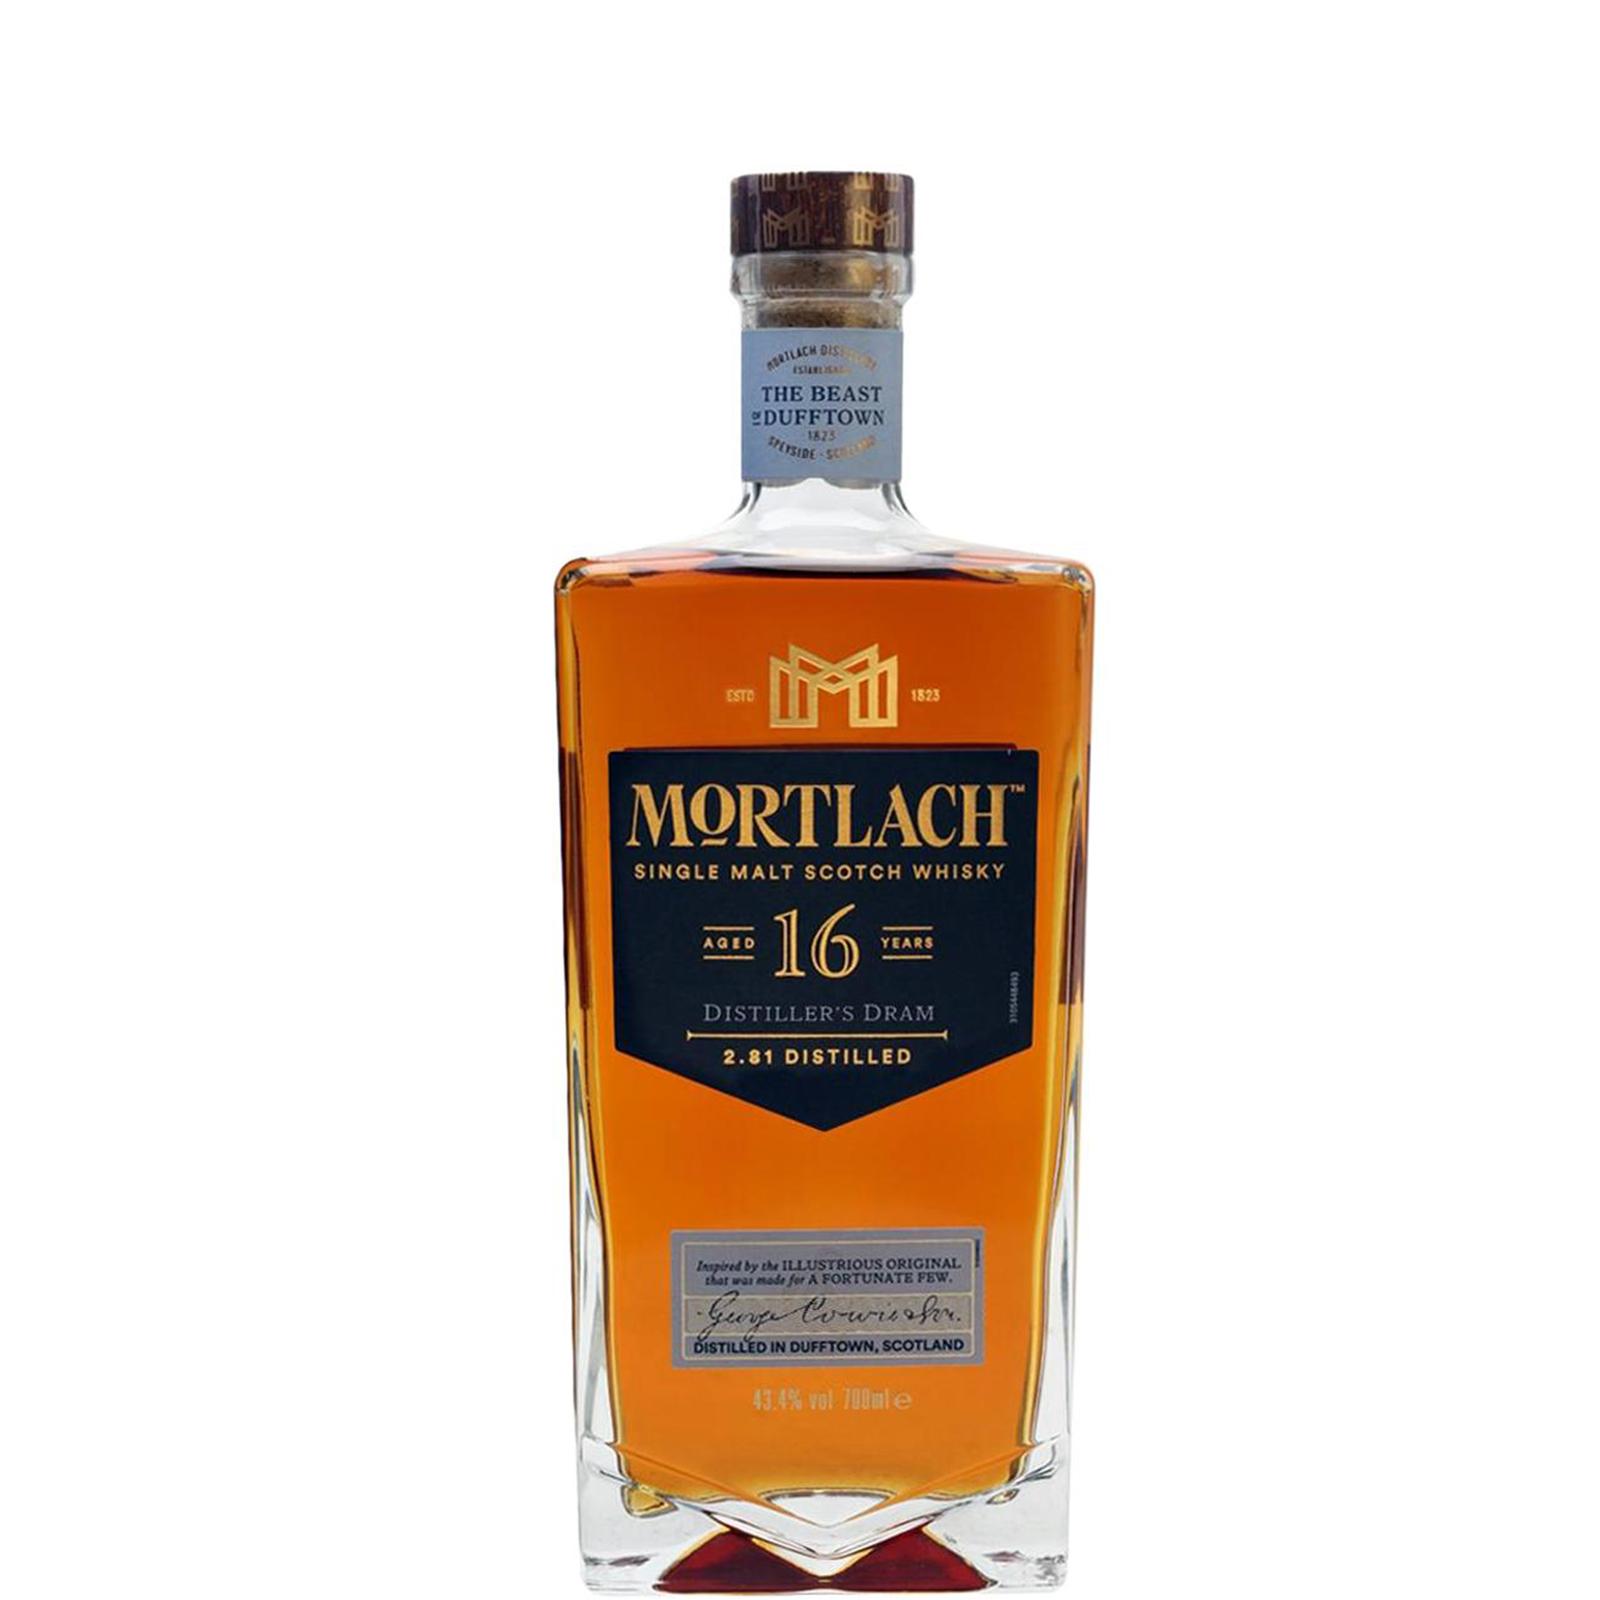 Mortlach 16 years